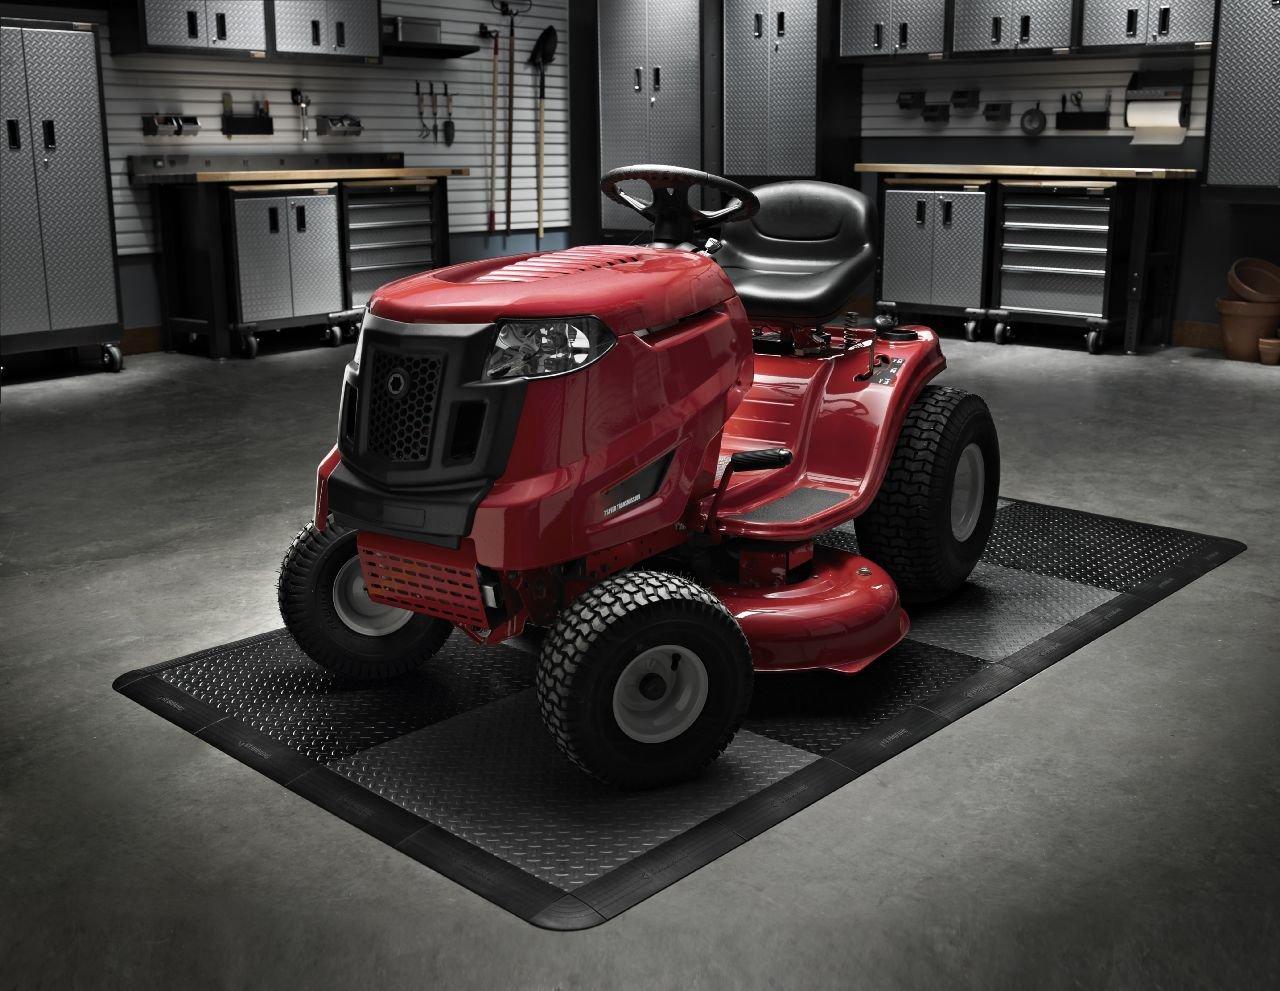 Gladiator Garage Works Gladiator GAFP32CBZM Floor Pack Whirlpool Corporation